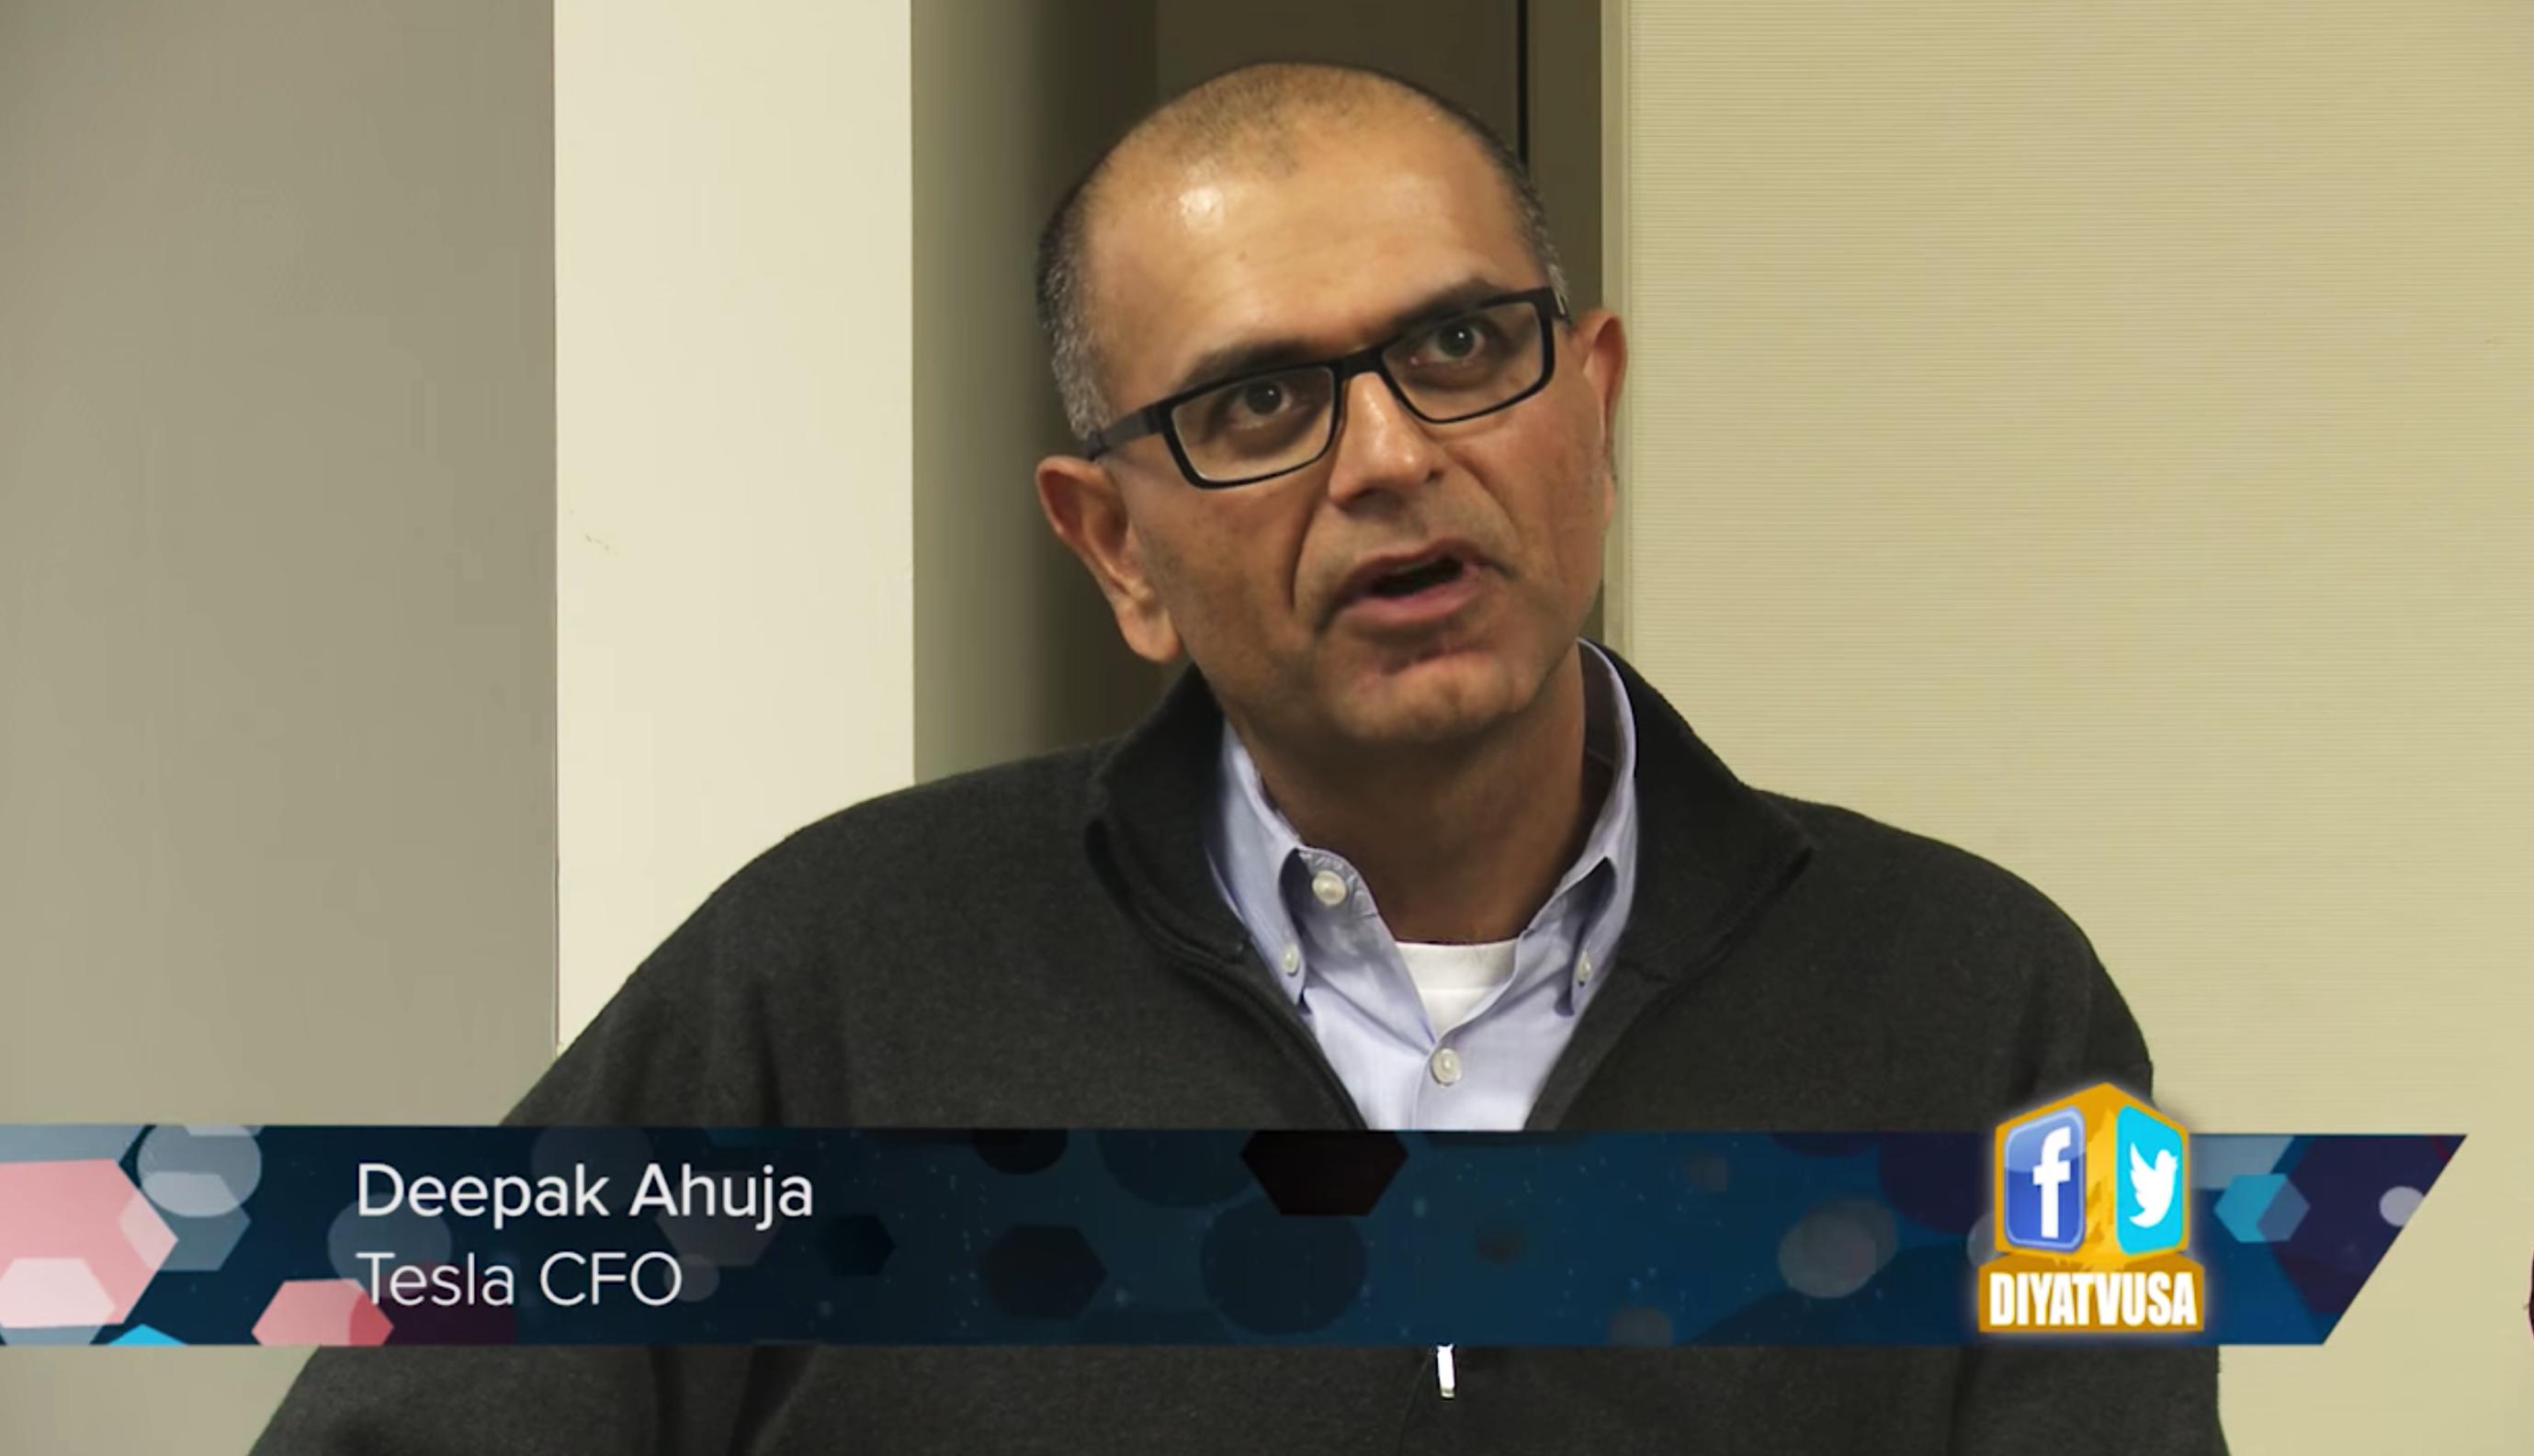 Deepak Ahuja, CFO Tesla